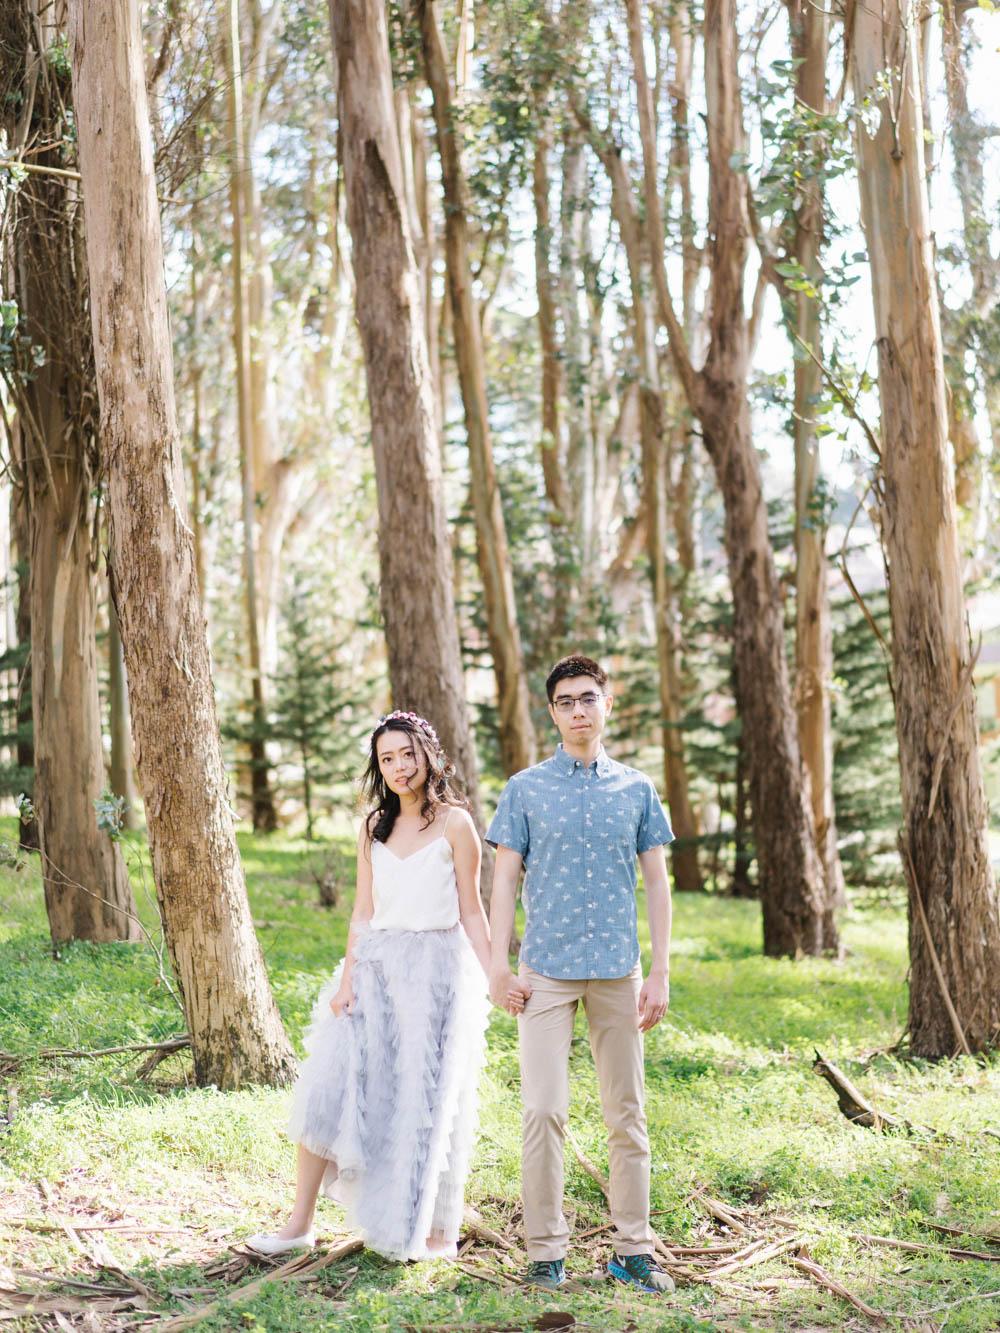 San Francisco Wedding Photographer - City Hall - Pinnel Photography-03384.jpg